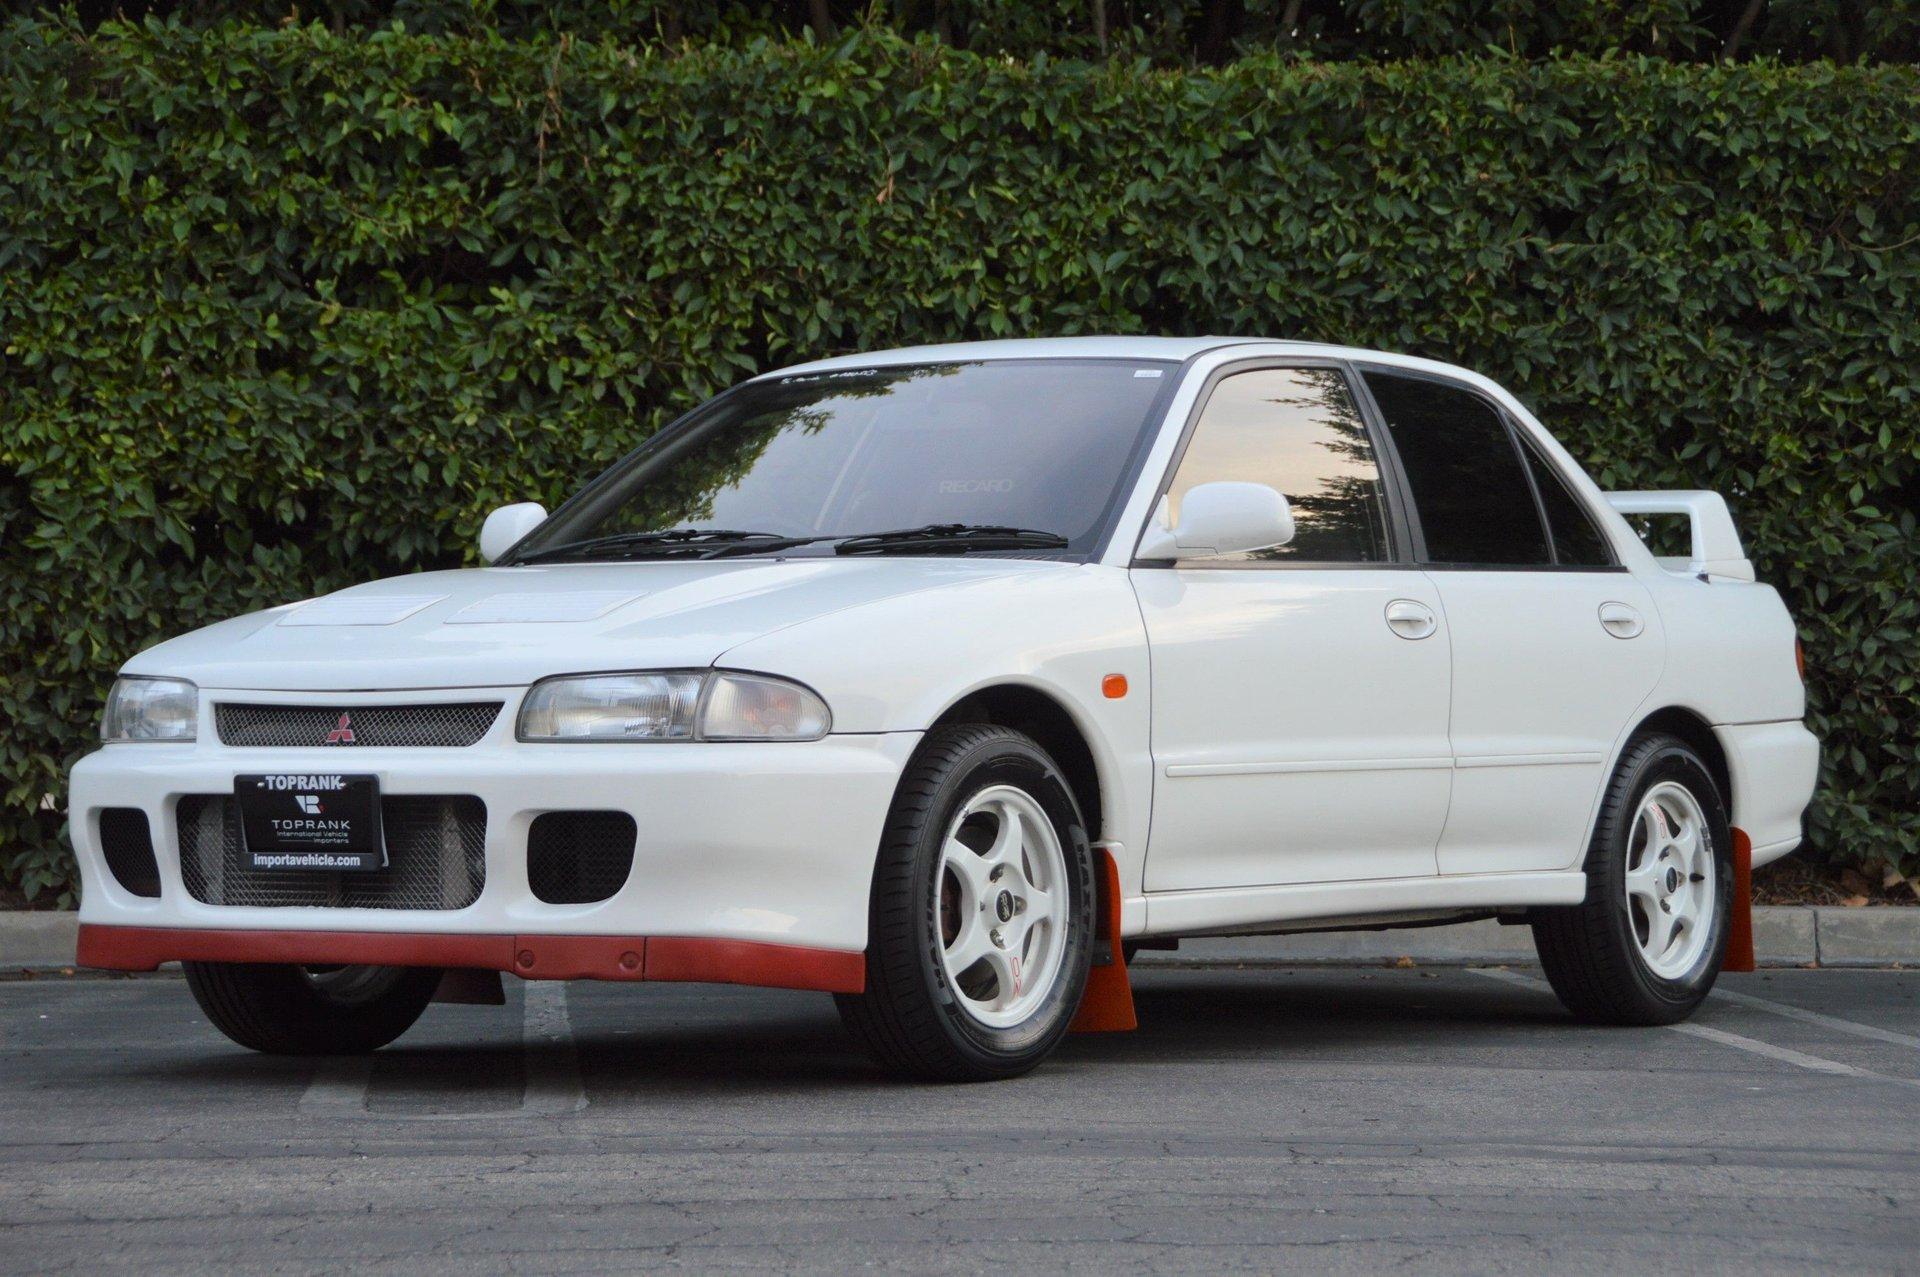 1994 Mitsubishi Lancer Evolution II GSR